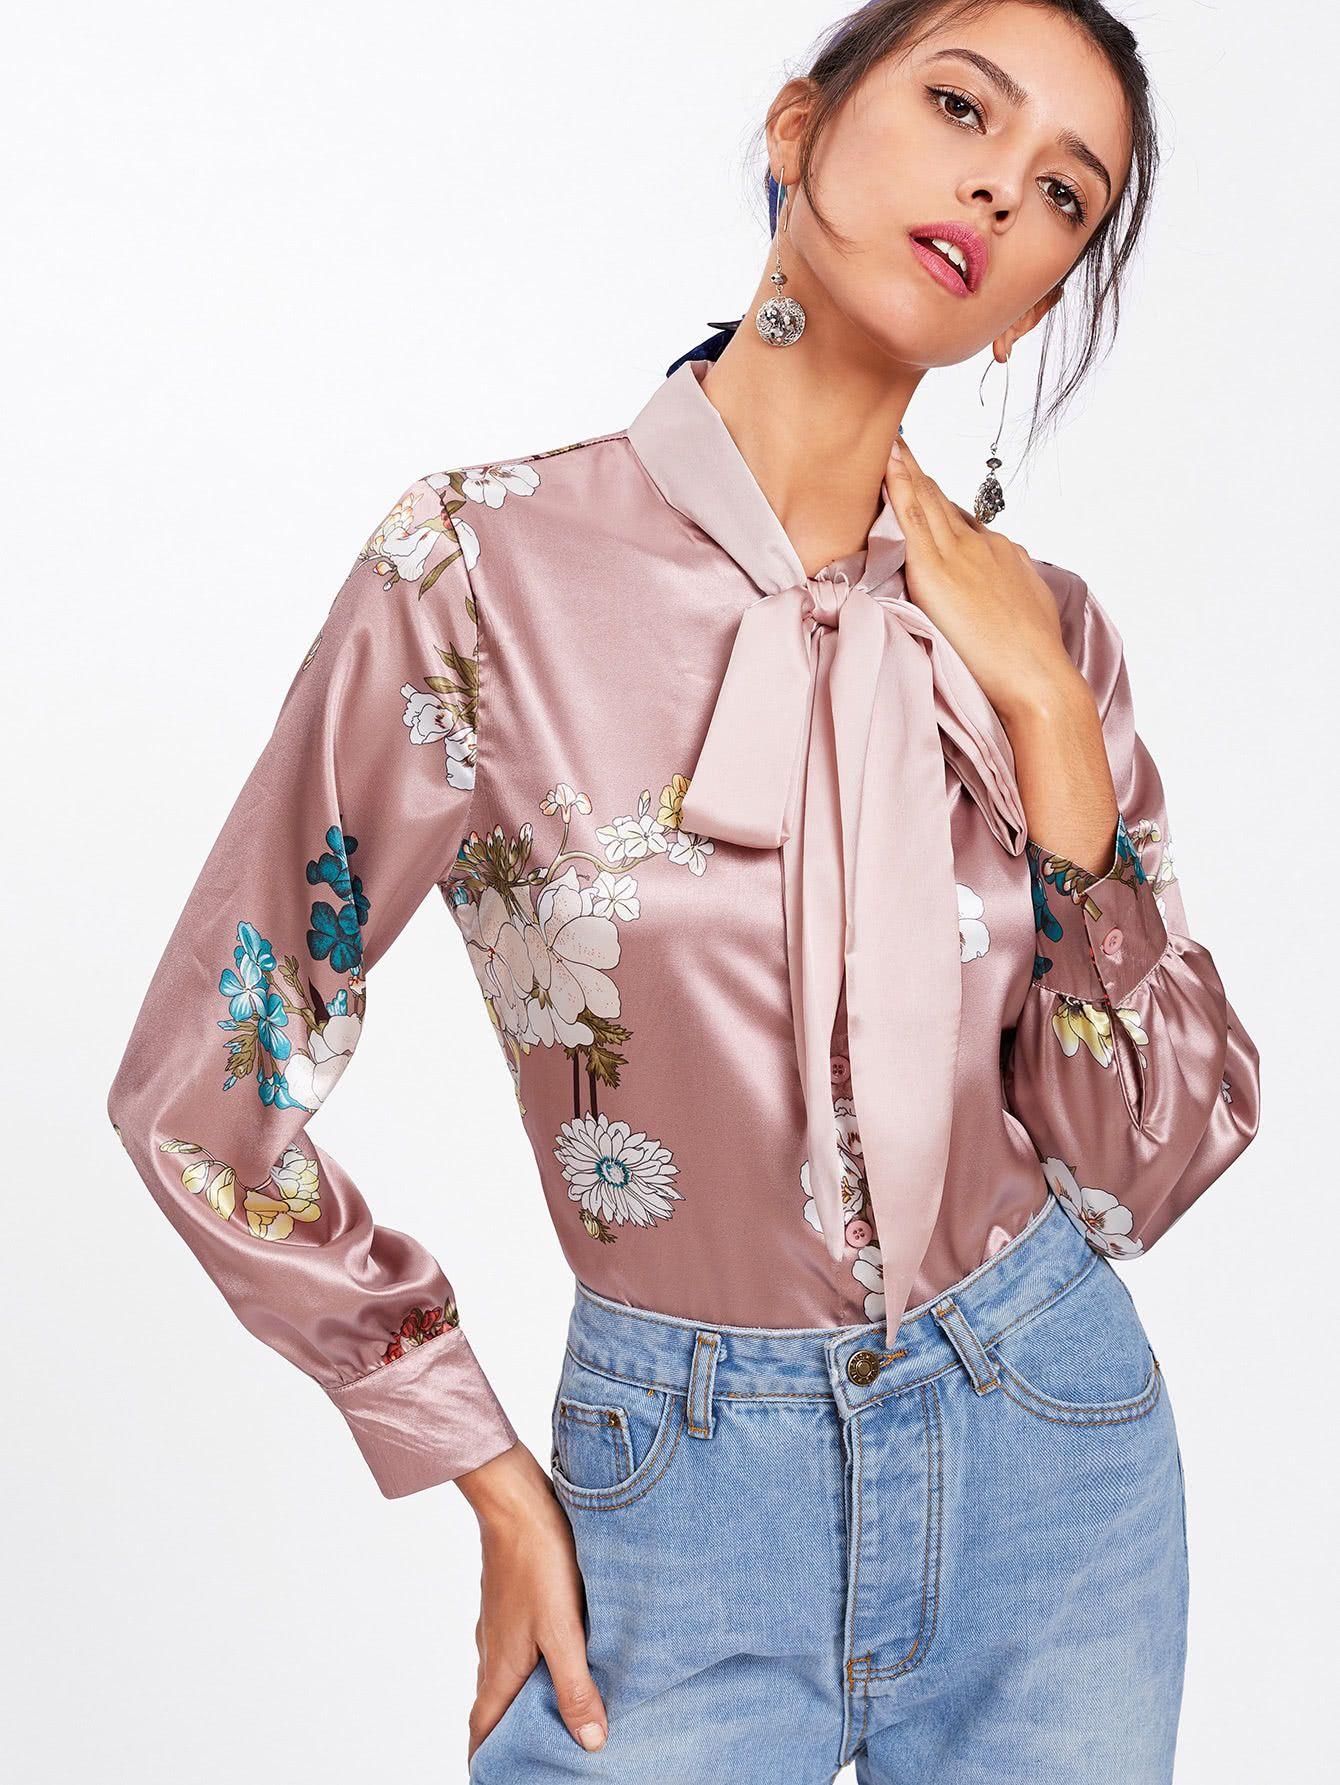 Goede Shop Flower Print Self Tie Bow Satin Shirt online. SheIn offers FW-33